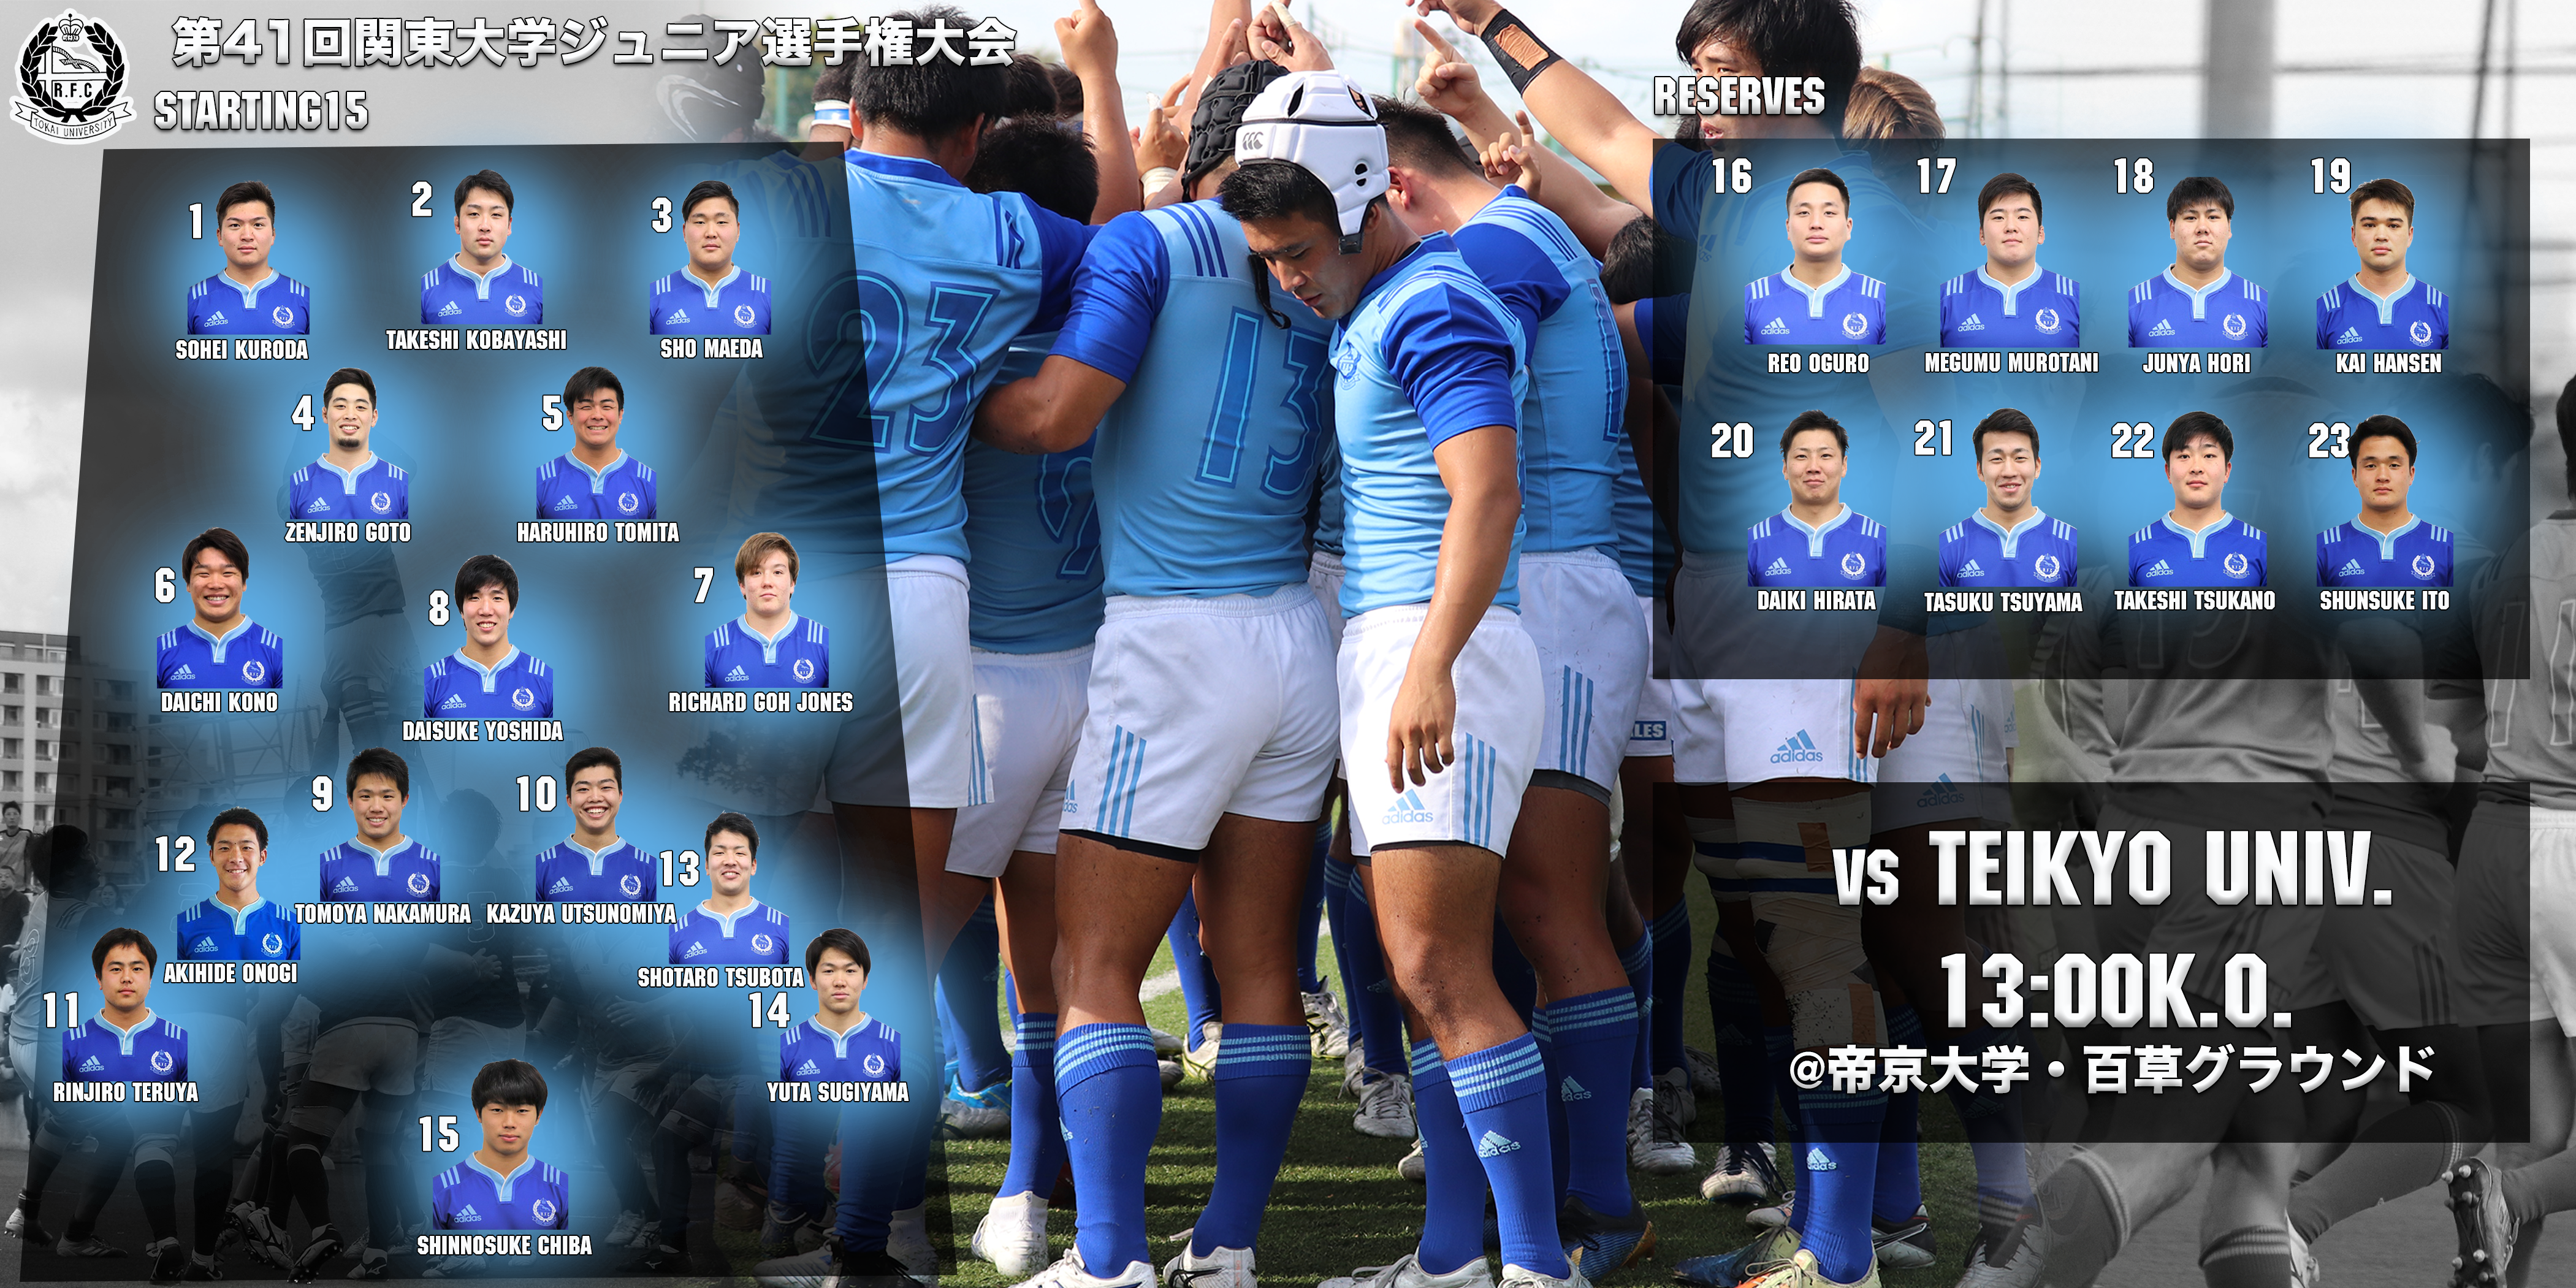 1006Jr.帝京大学戦 member15.png